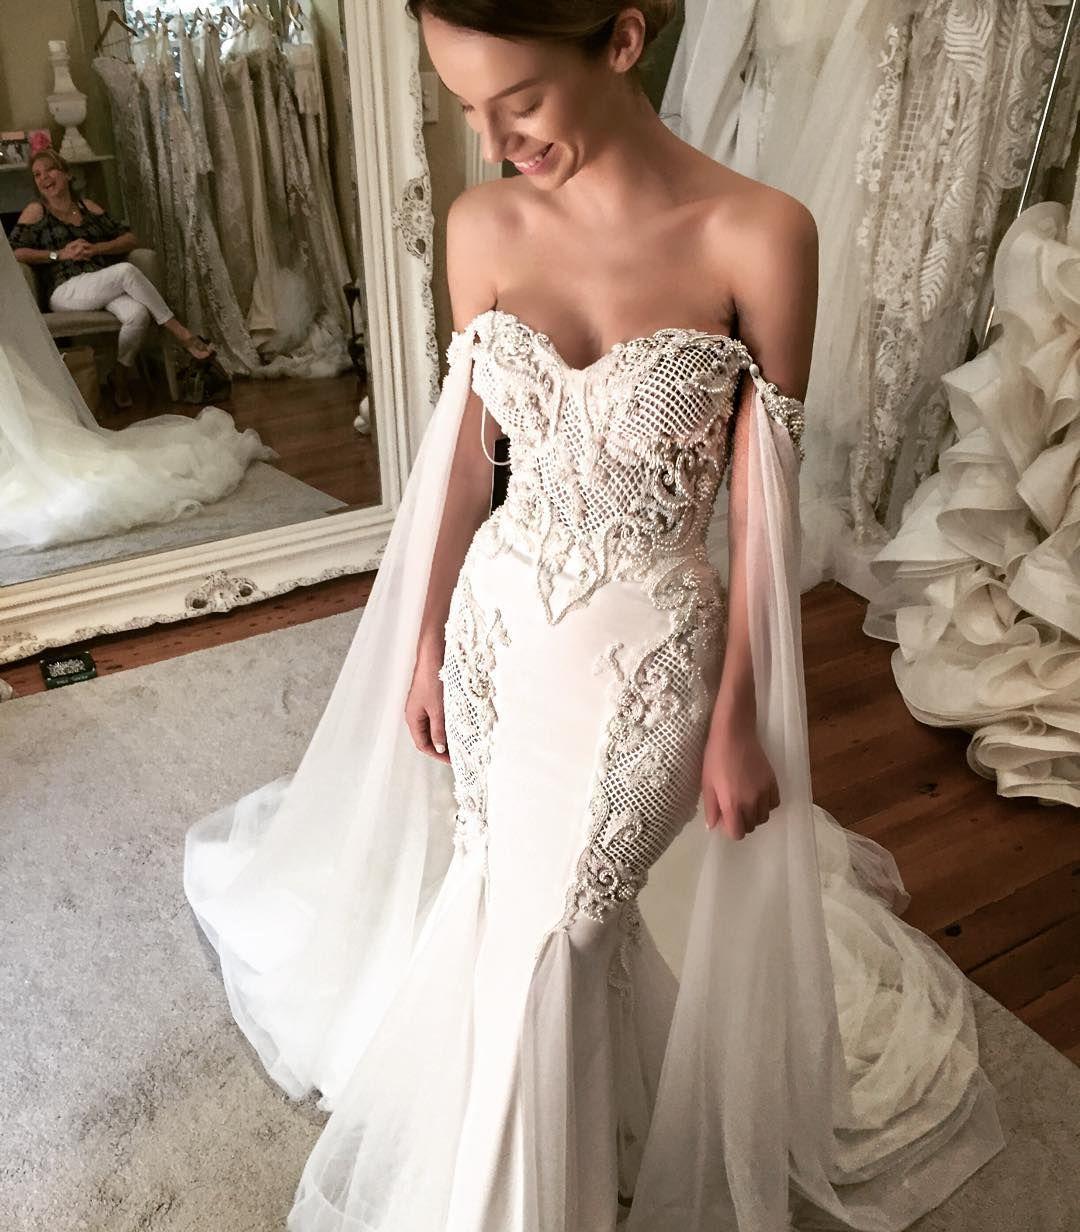 Pin by james fergason on wedding dresses pinterest wedding dress